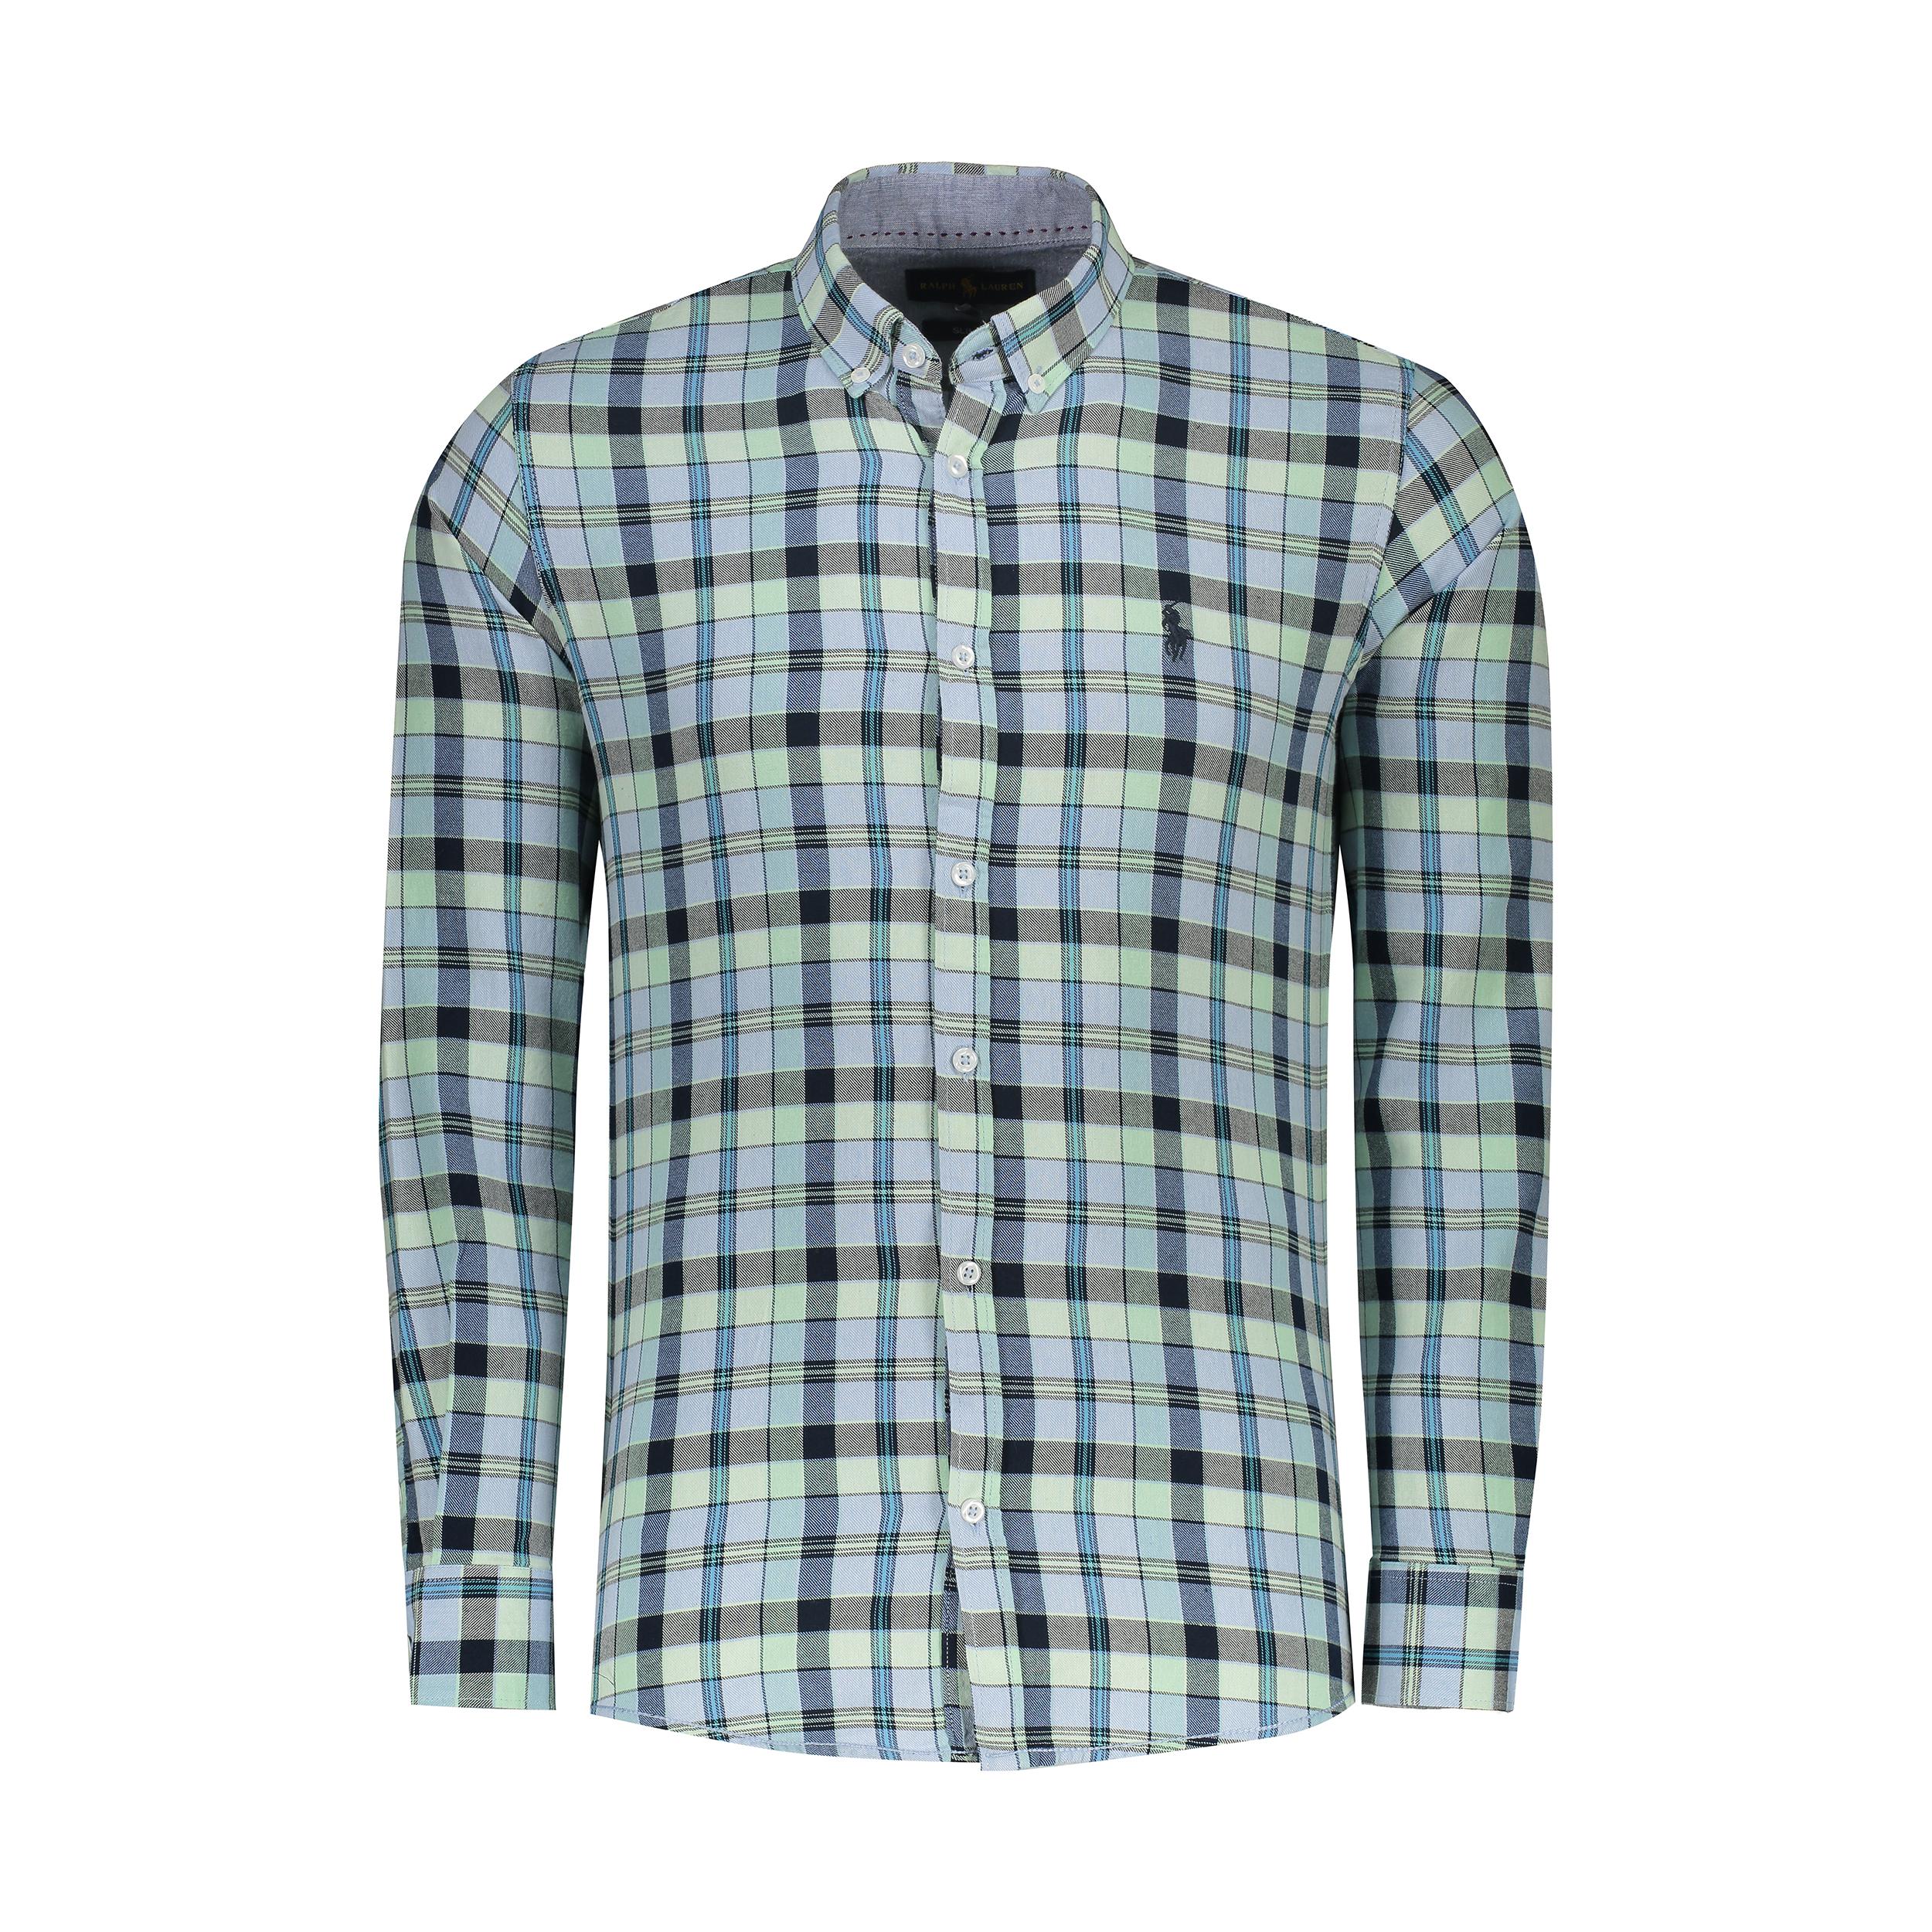 پیراهن آستین بلند مردانه پولو مدل A448